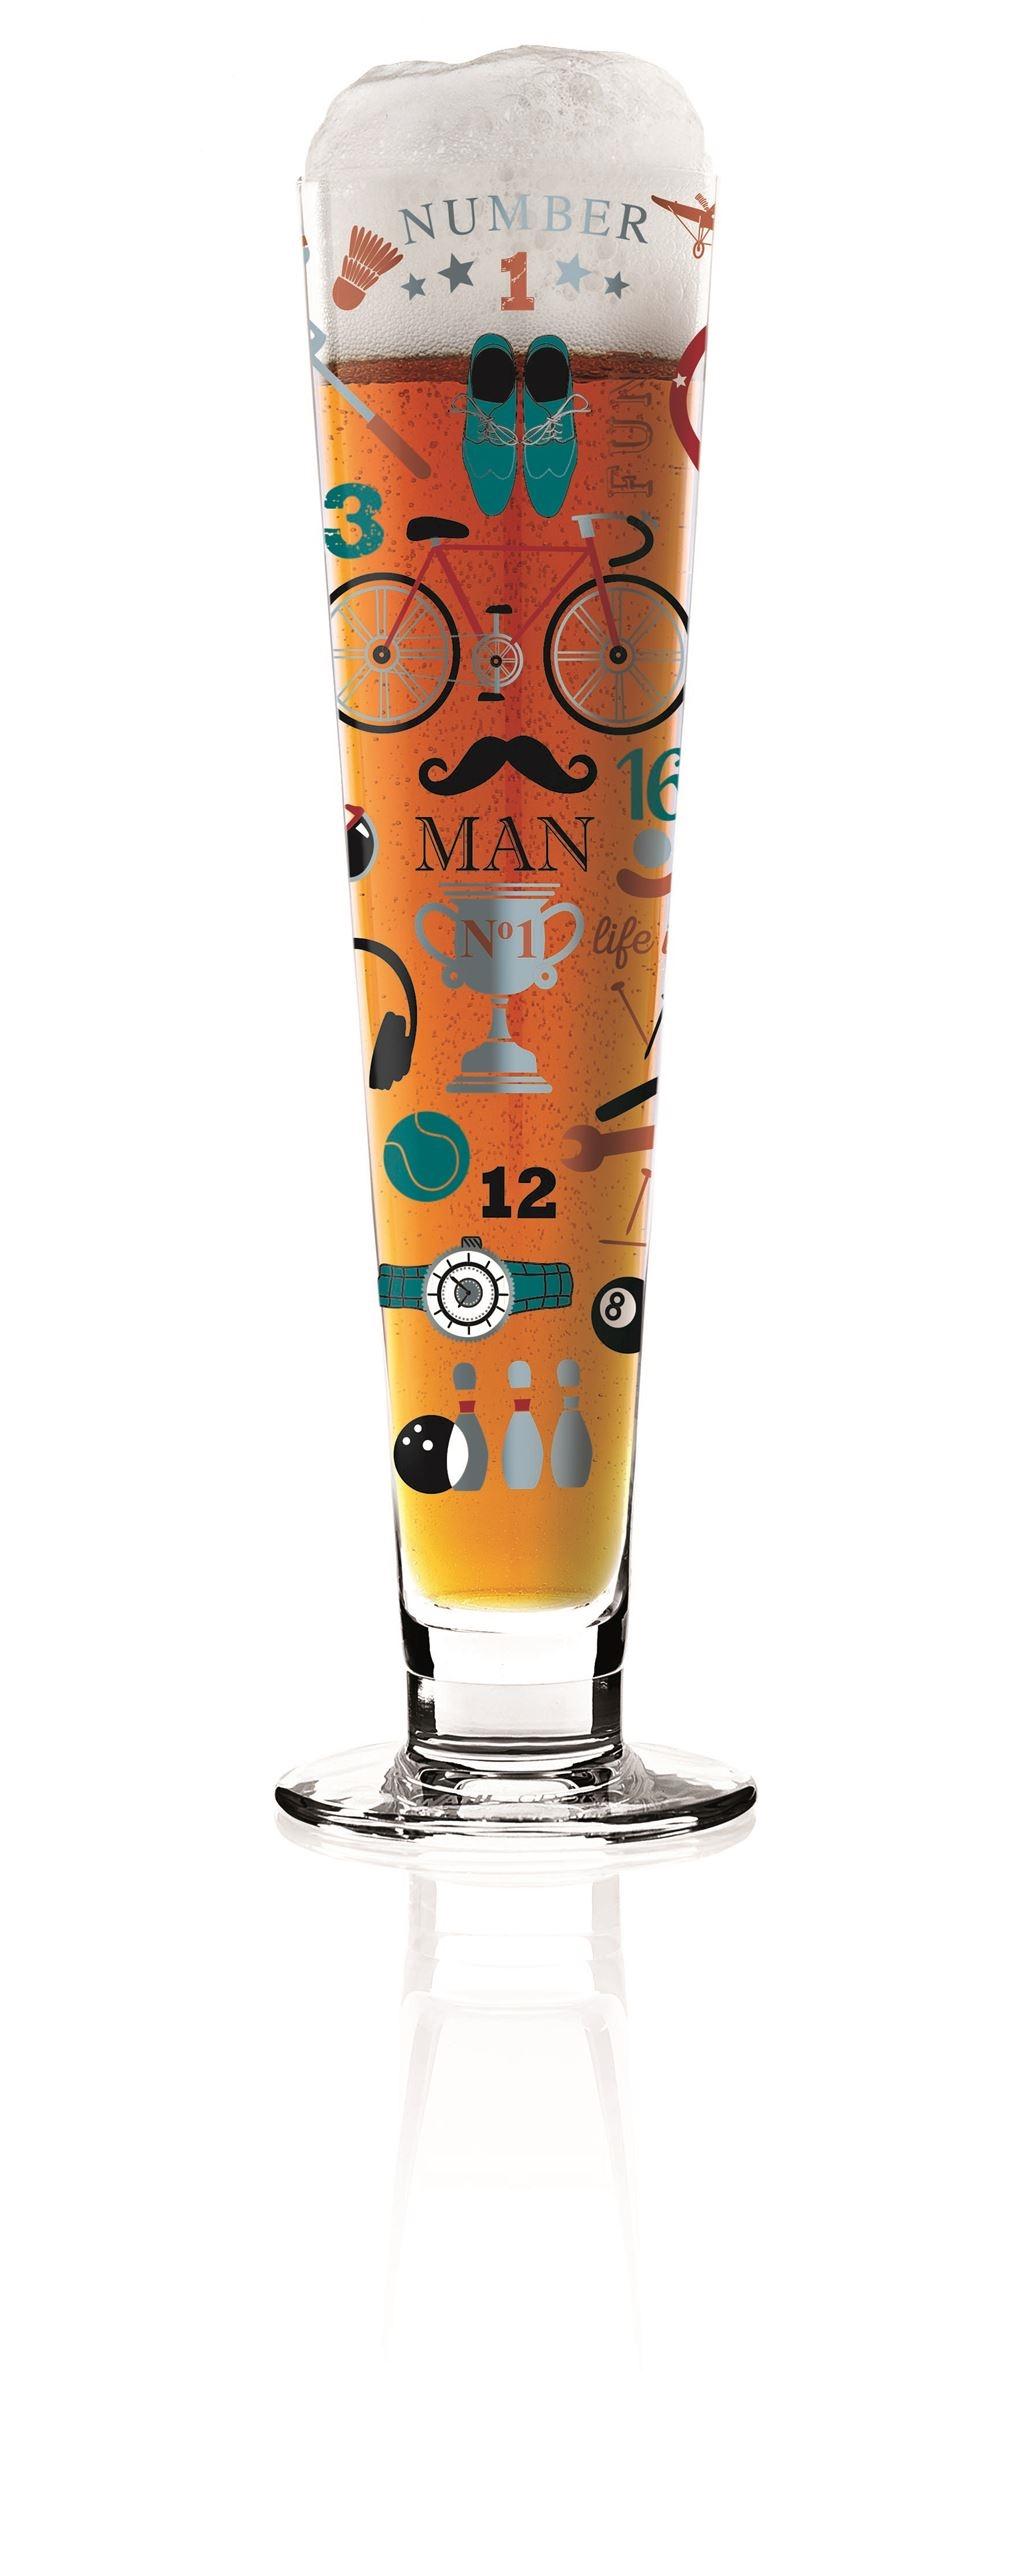 Number 1 kozarec pivo 0,40 l